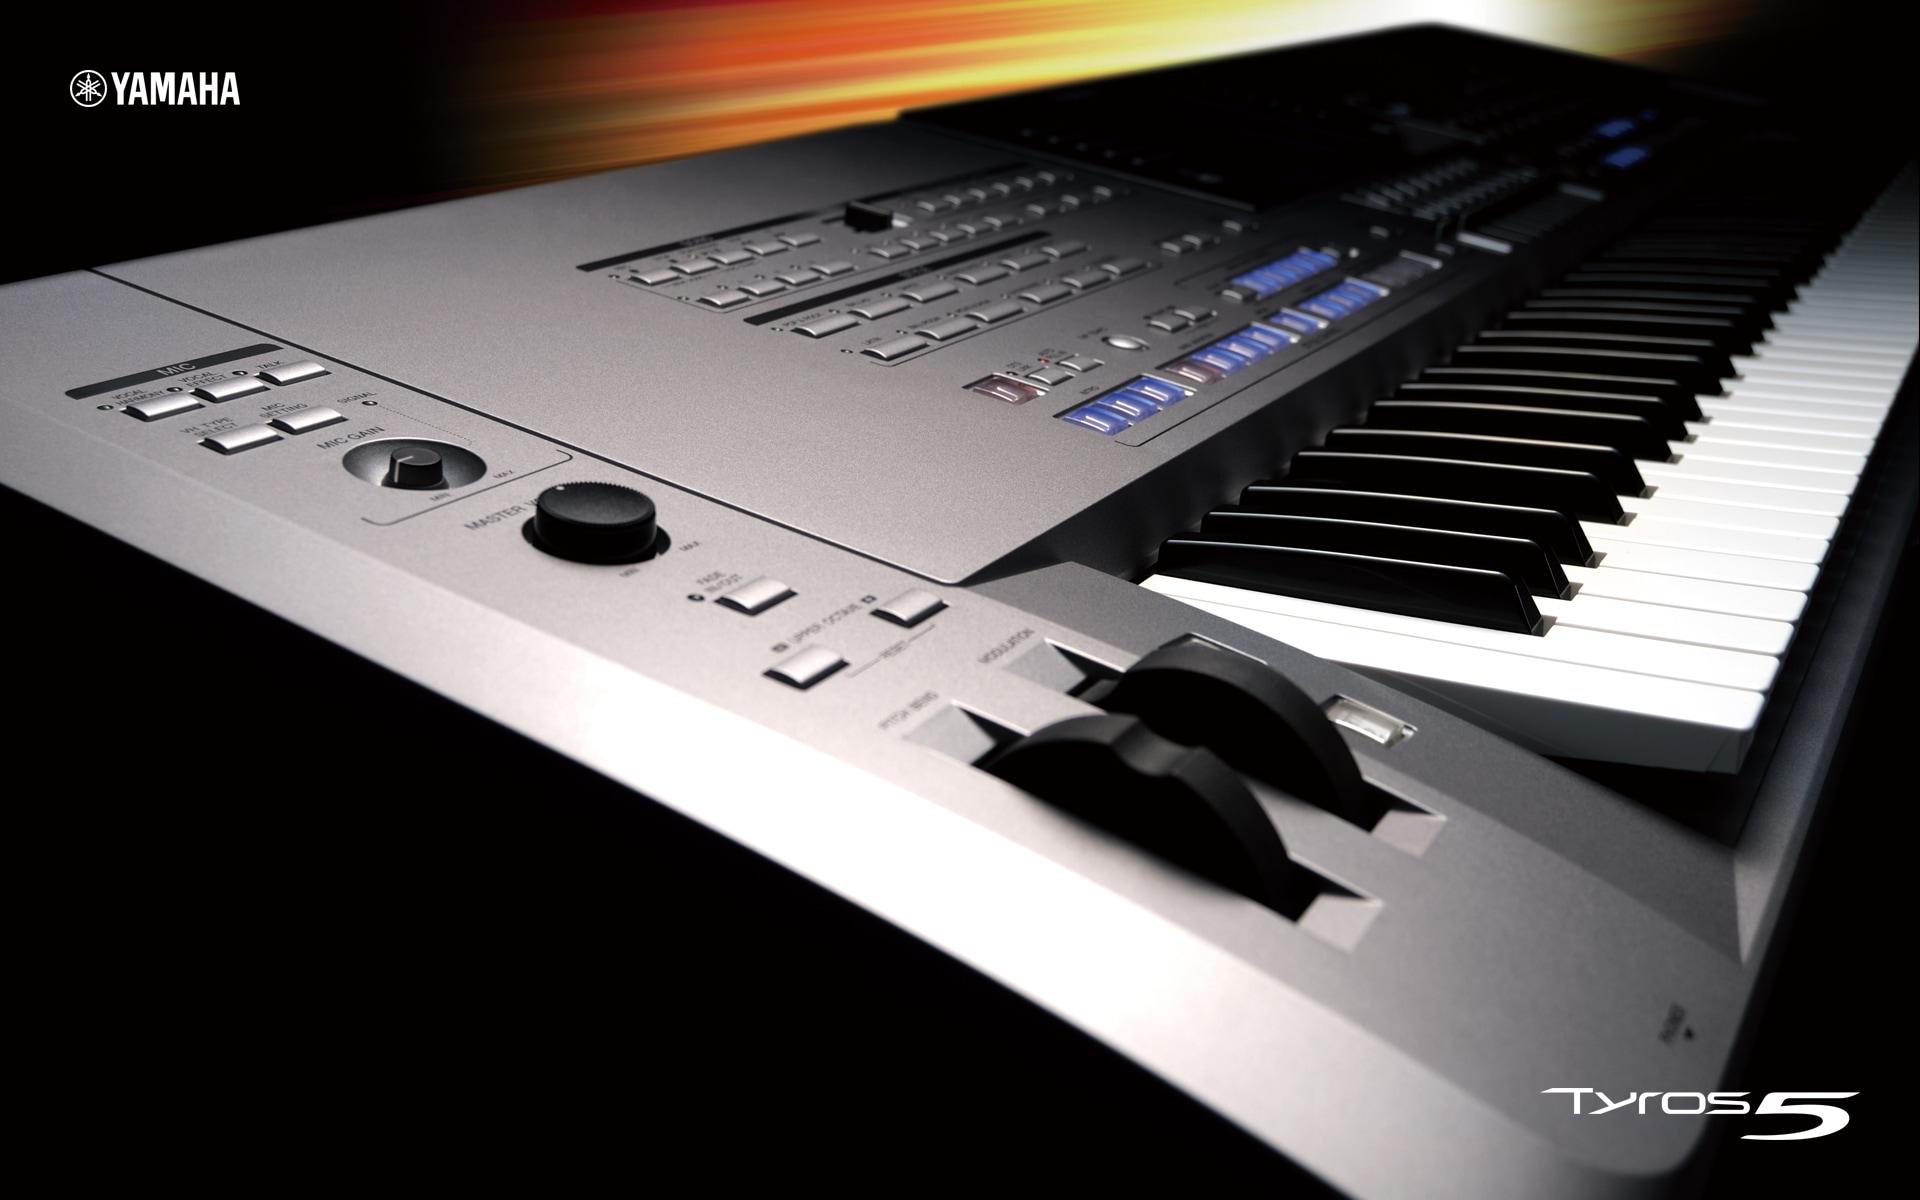 Yamaha keyboard tyros 5 price